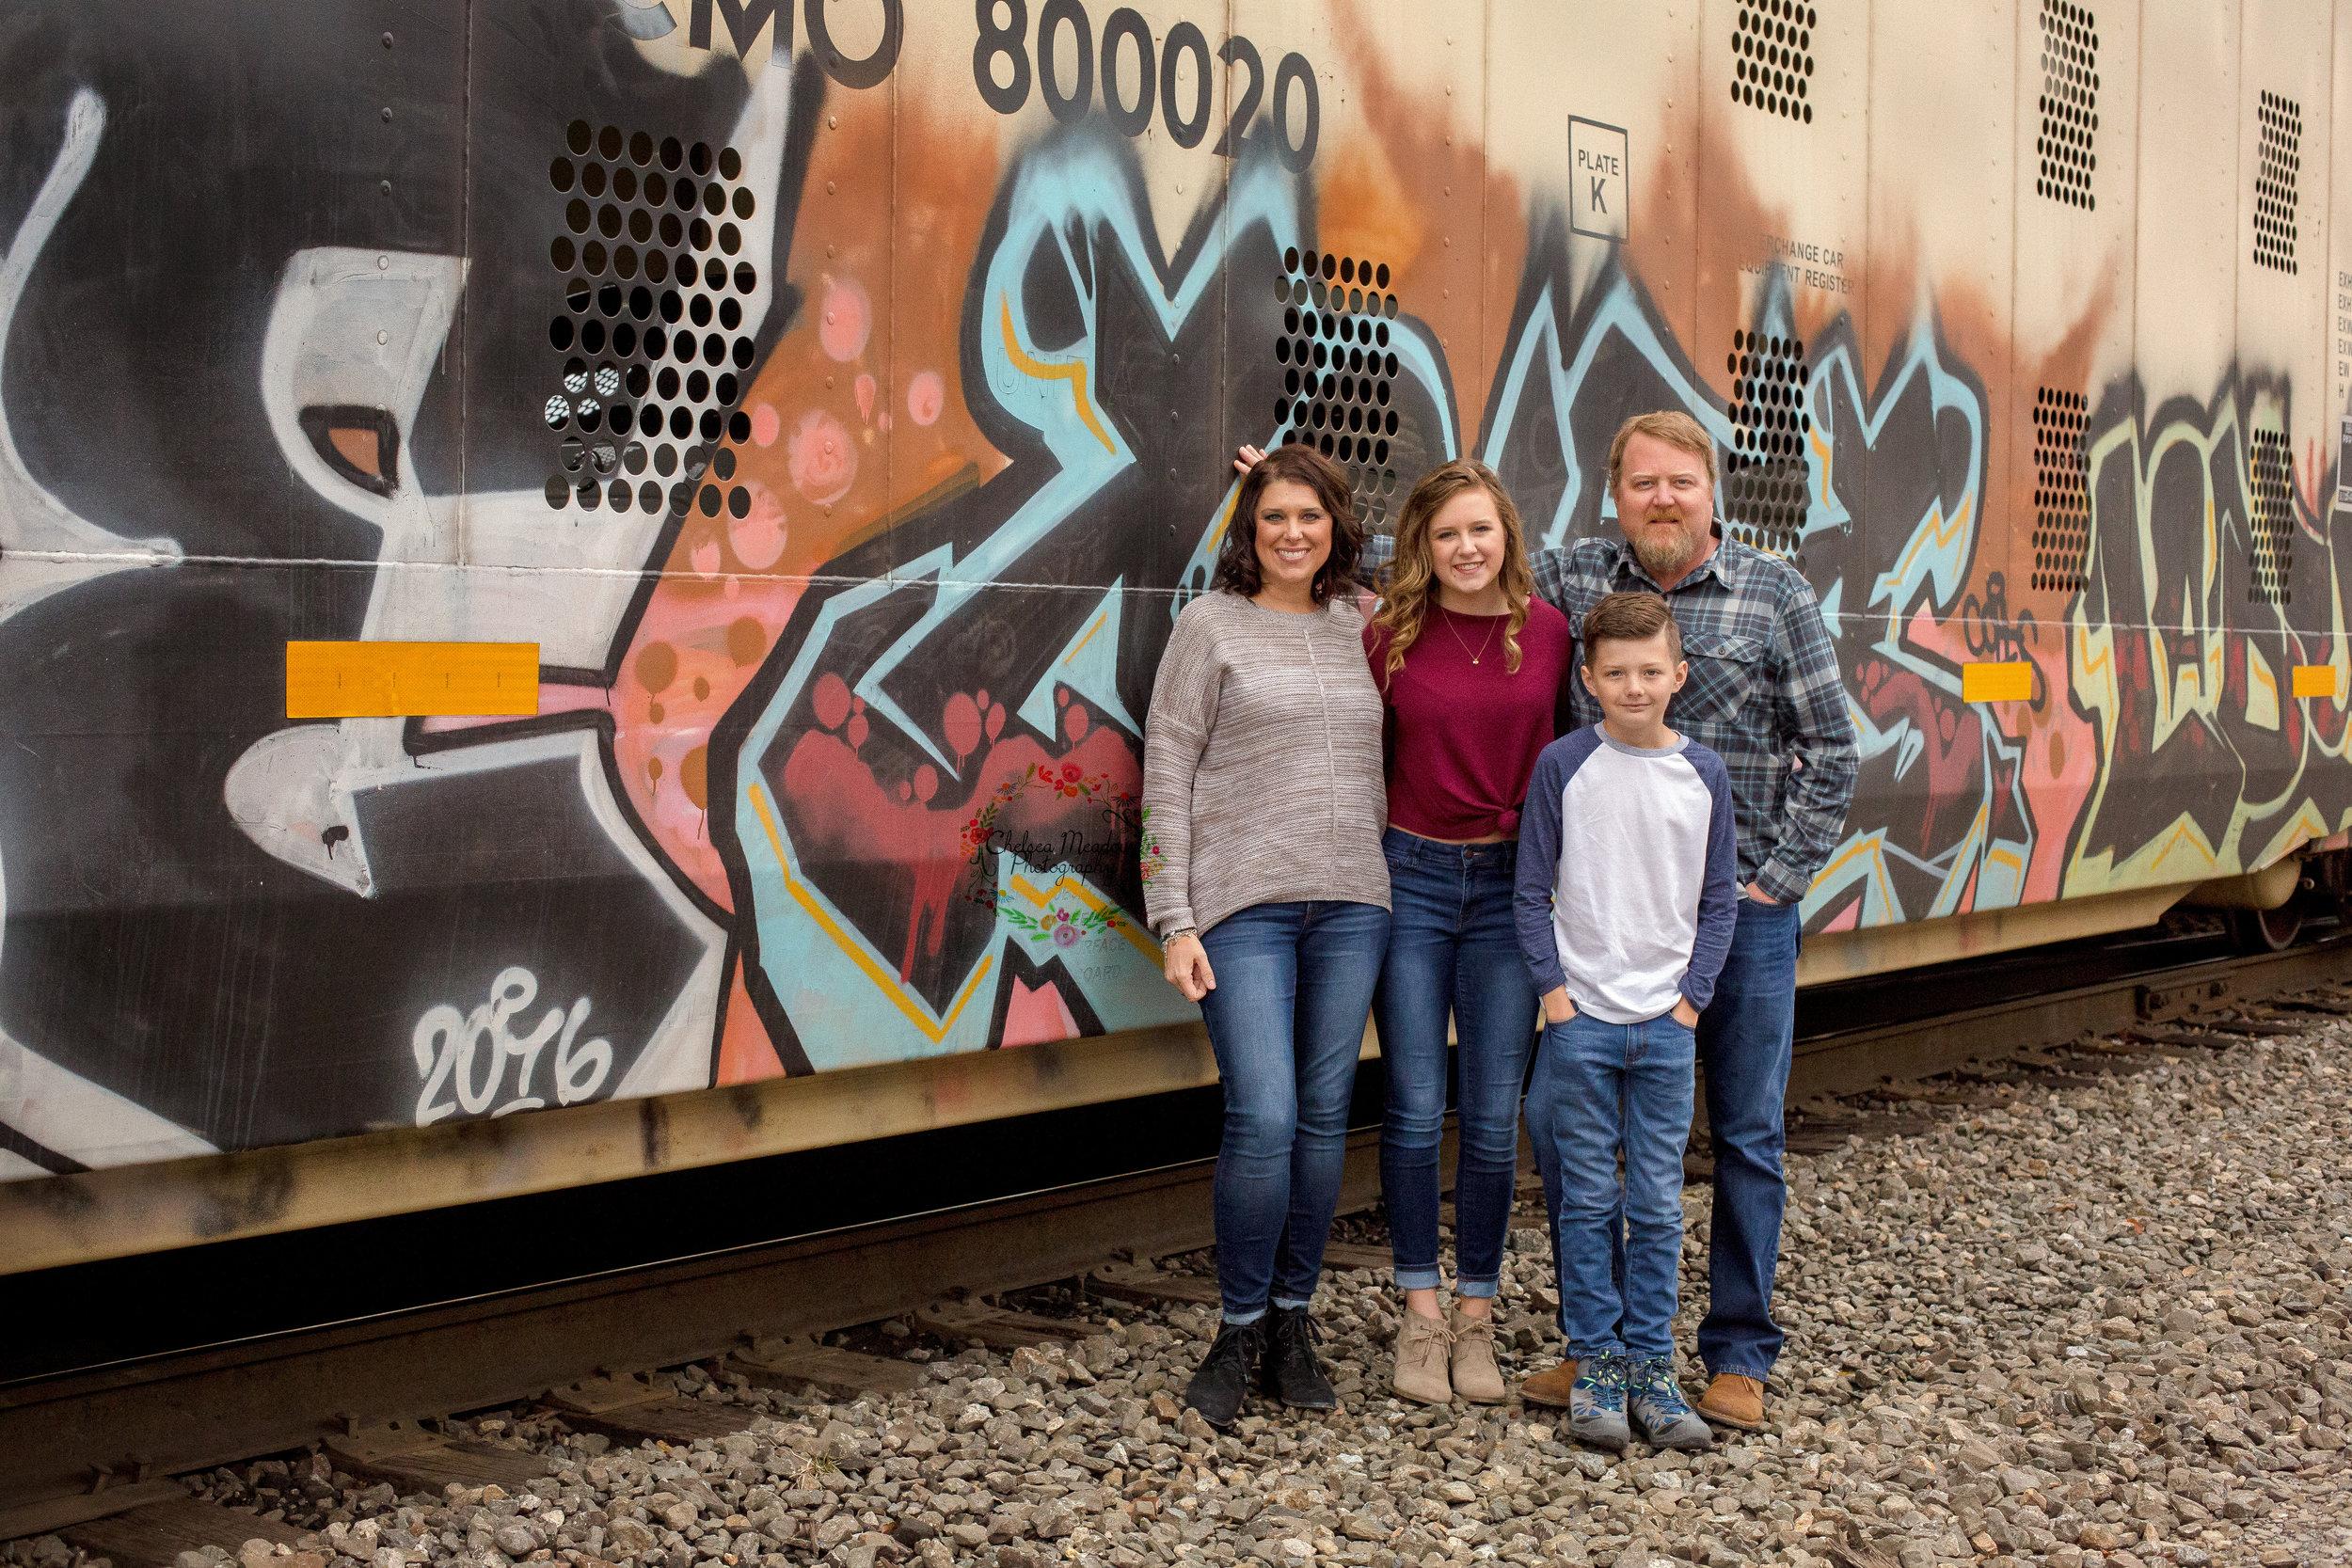 Shannon Family Session - Nashville Family Photographer - Chelsea Meadows Photography (58).jpg